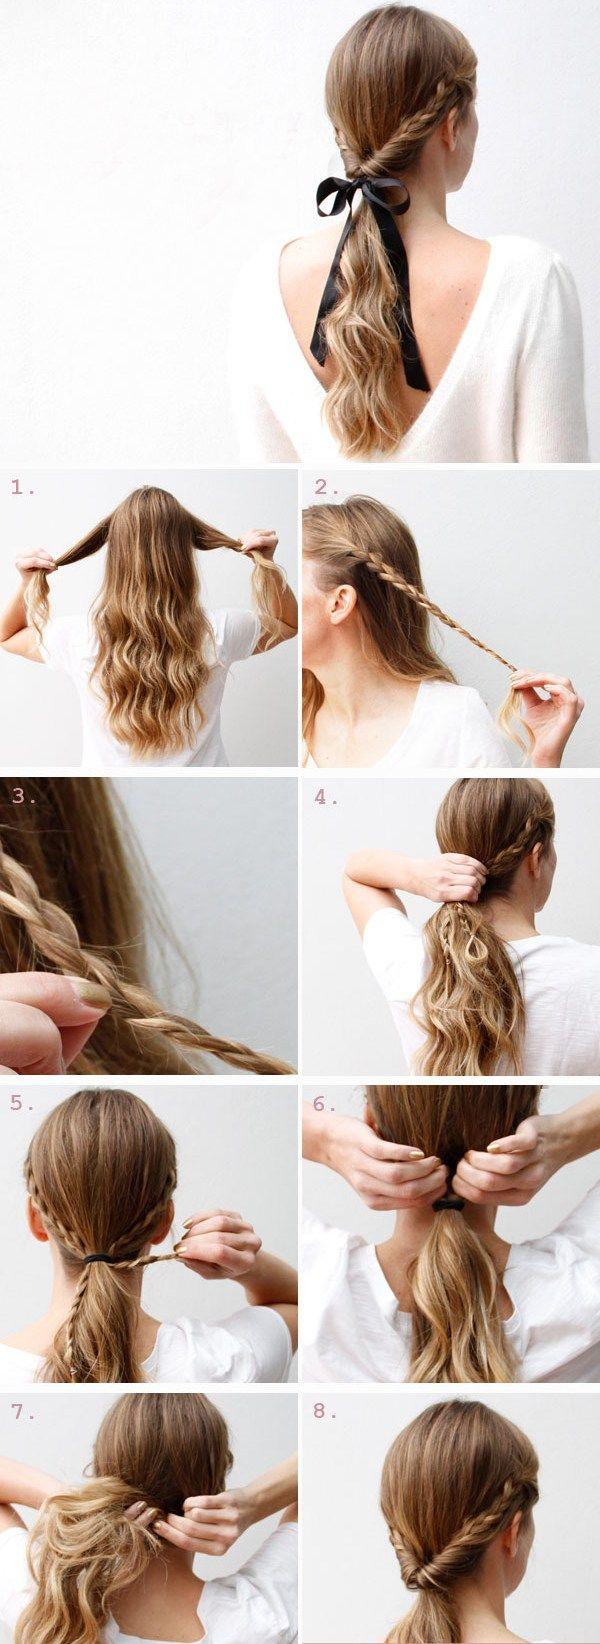 Easy pretty hairstyles step by step